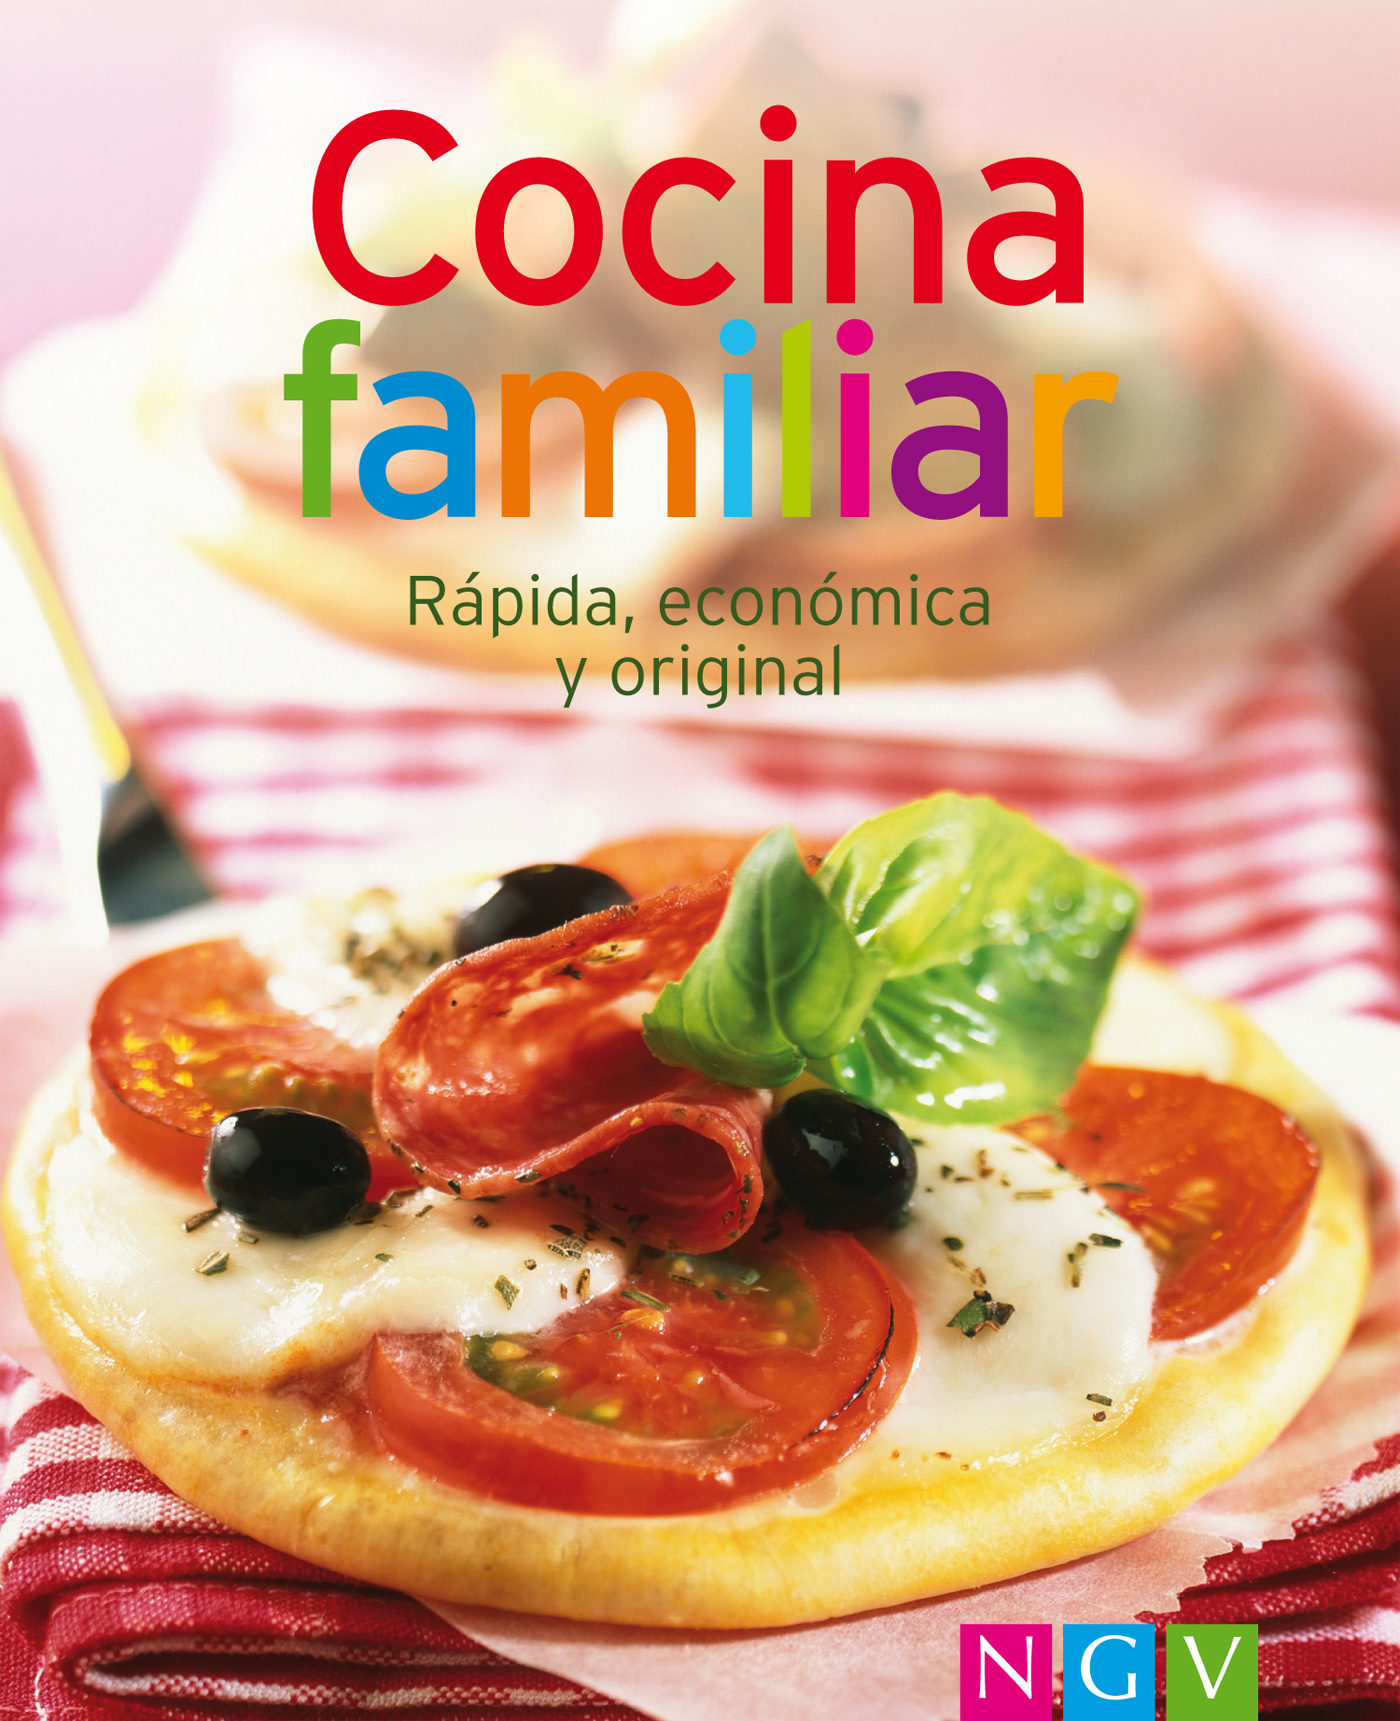 Cocina familiar ebook ebooks el corte ingl s for Cocina familiar